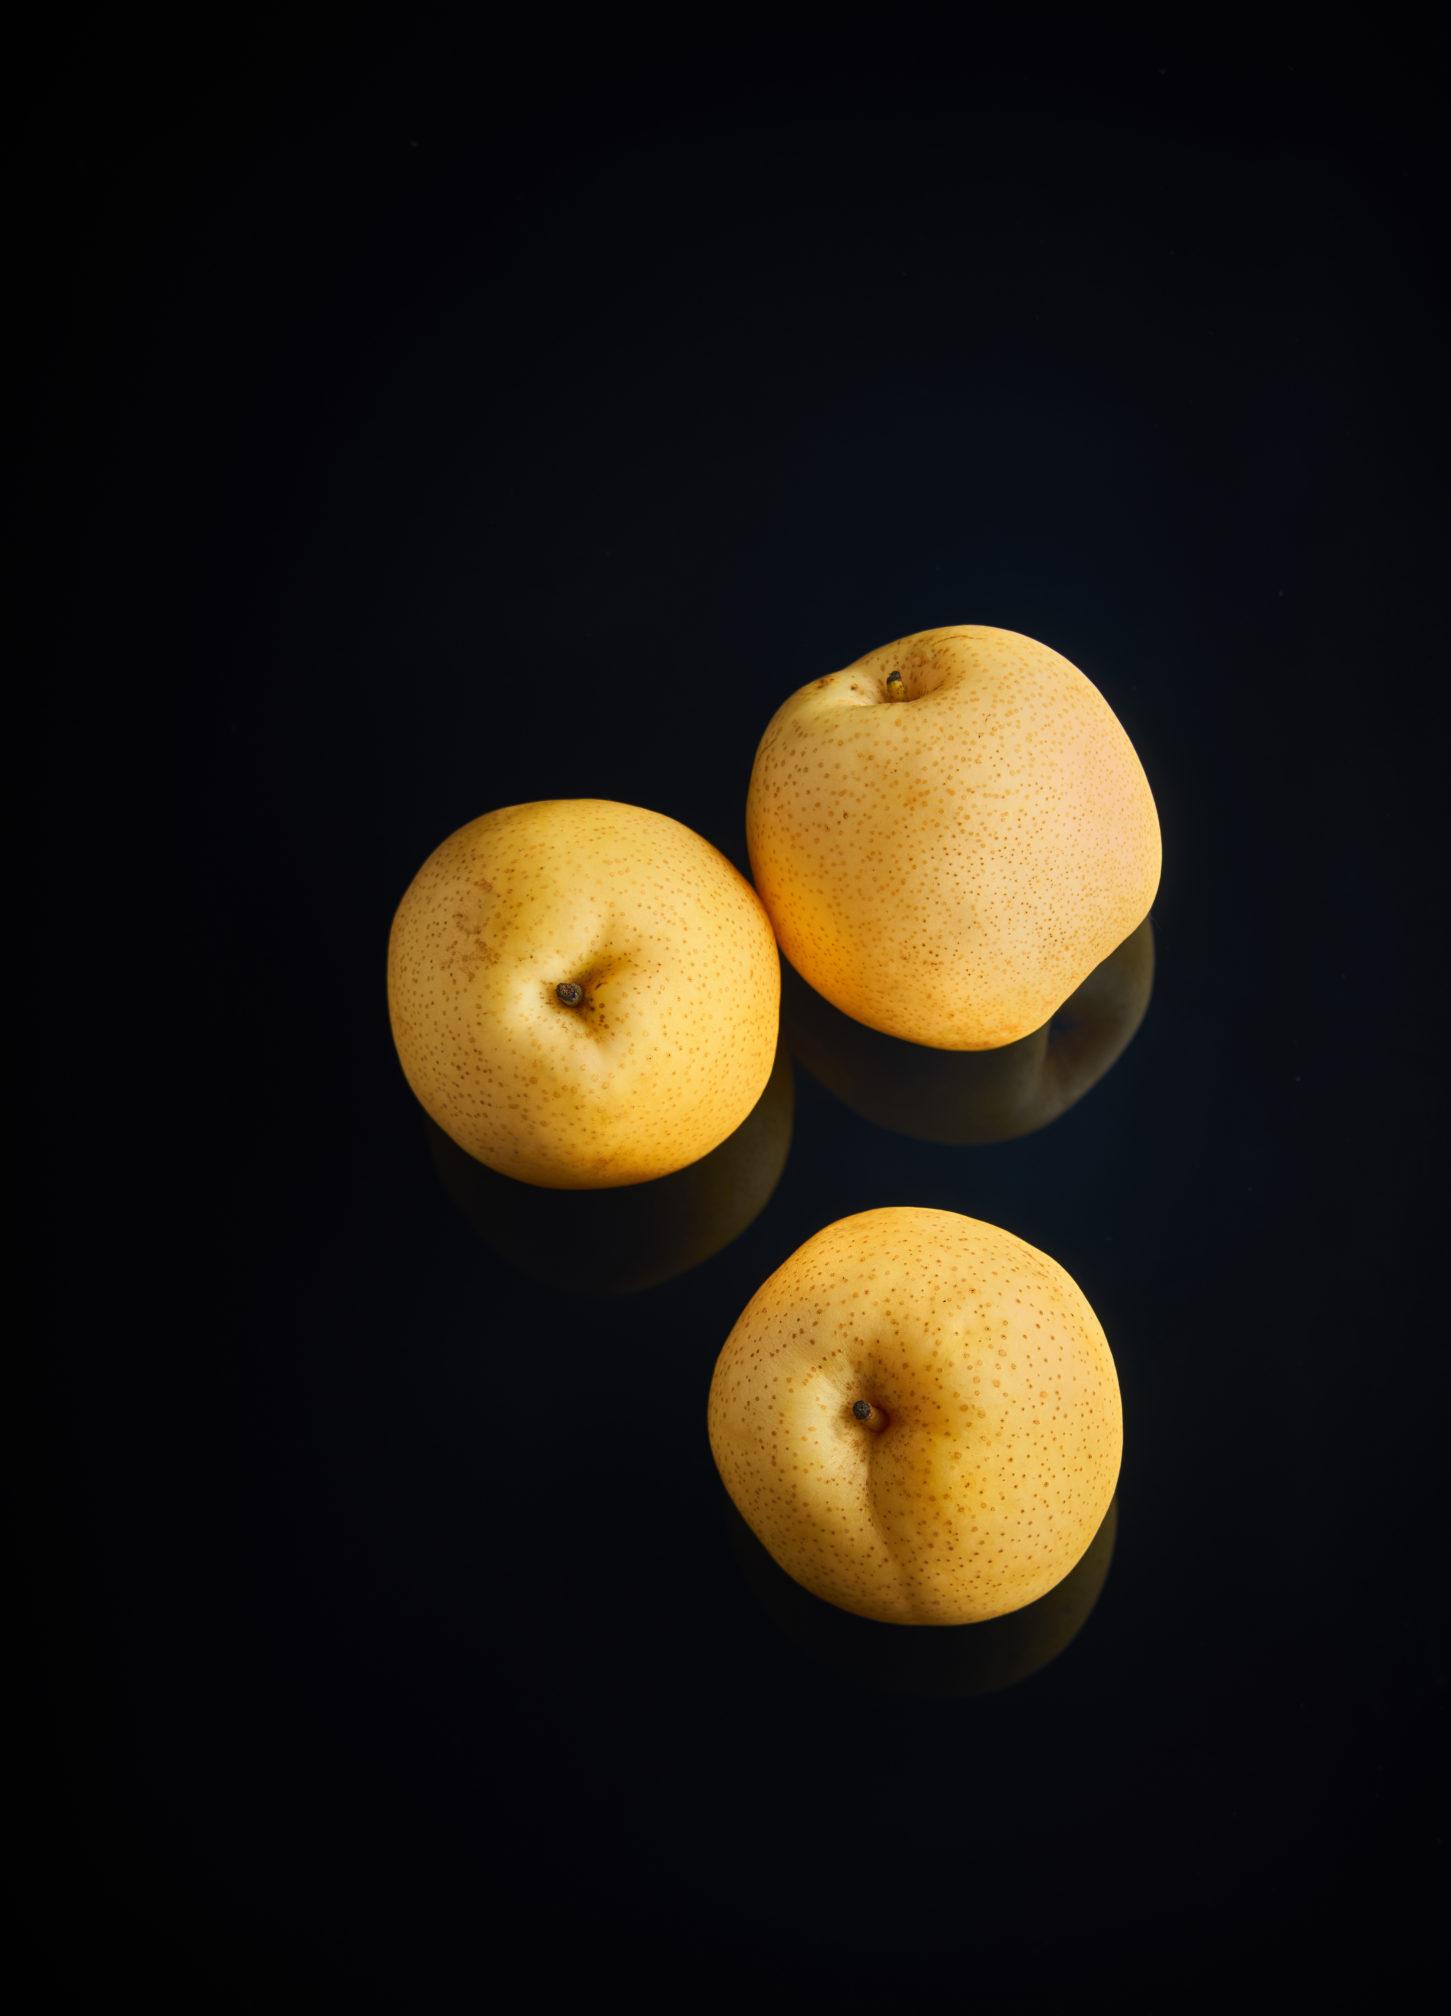 capexo-lilot-fruits-exotique-nashi-chine